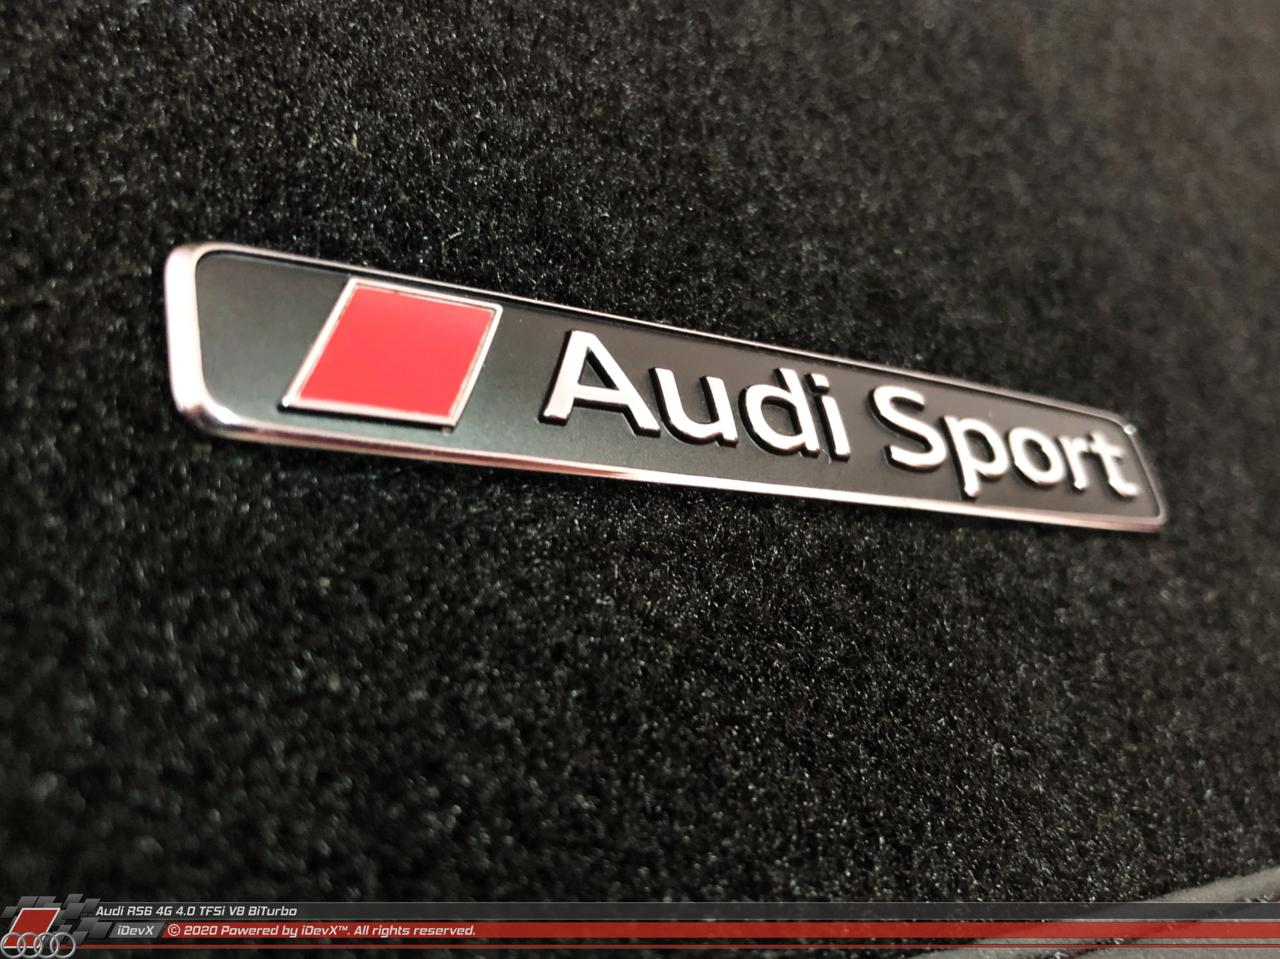 15_08.2019_Audi-RS6_iDevX_008.png